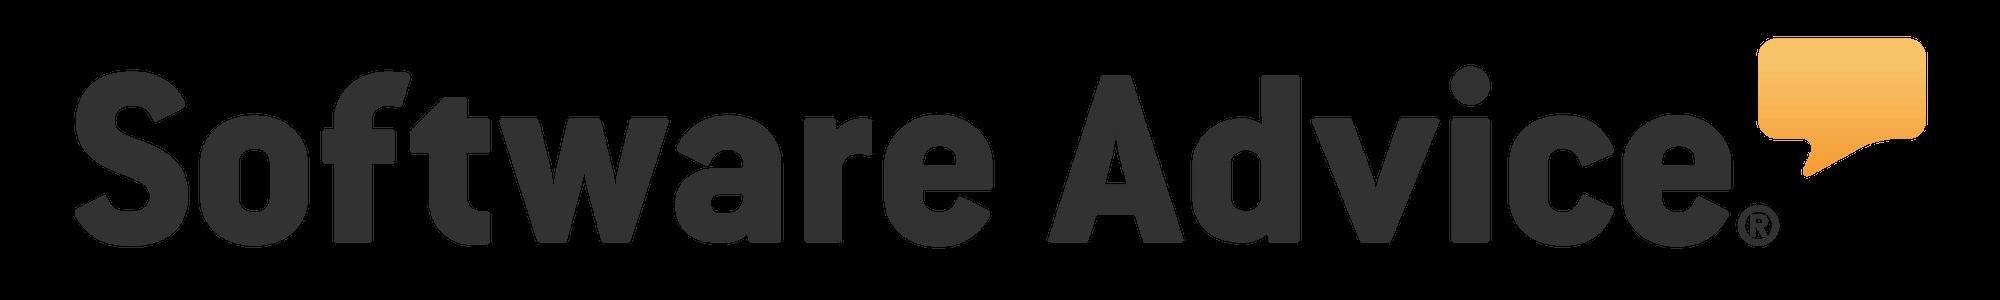 Software advice logo (1)